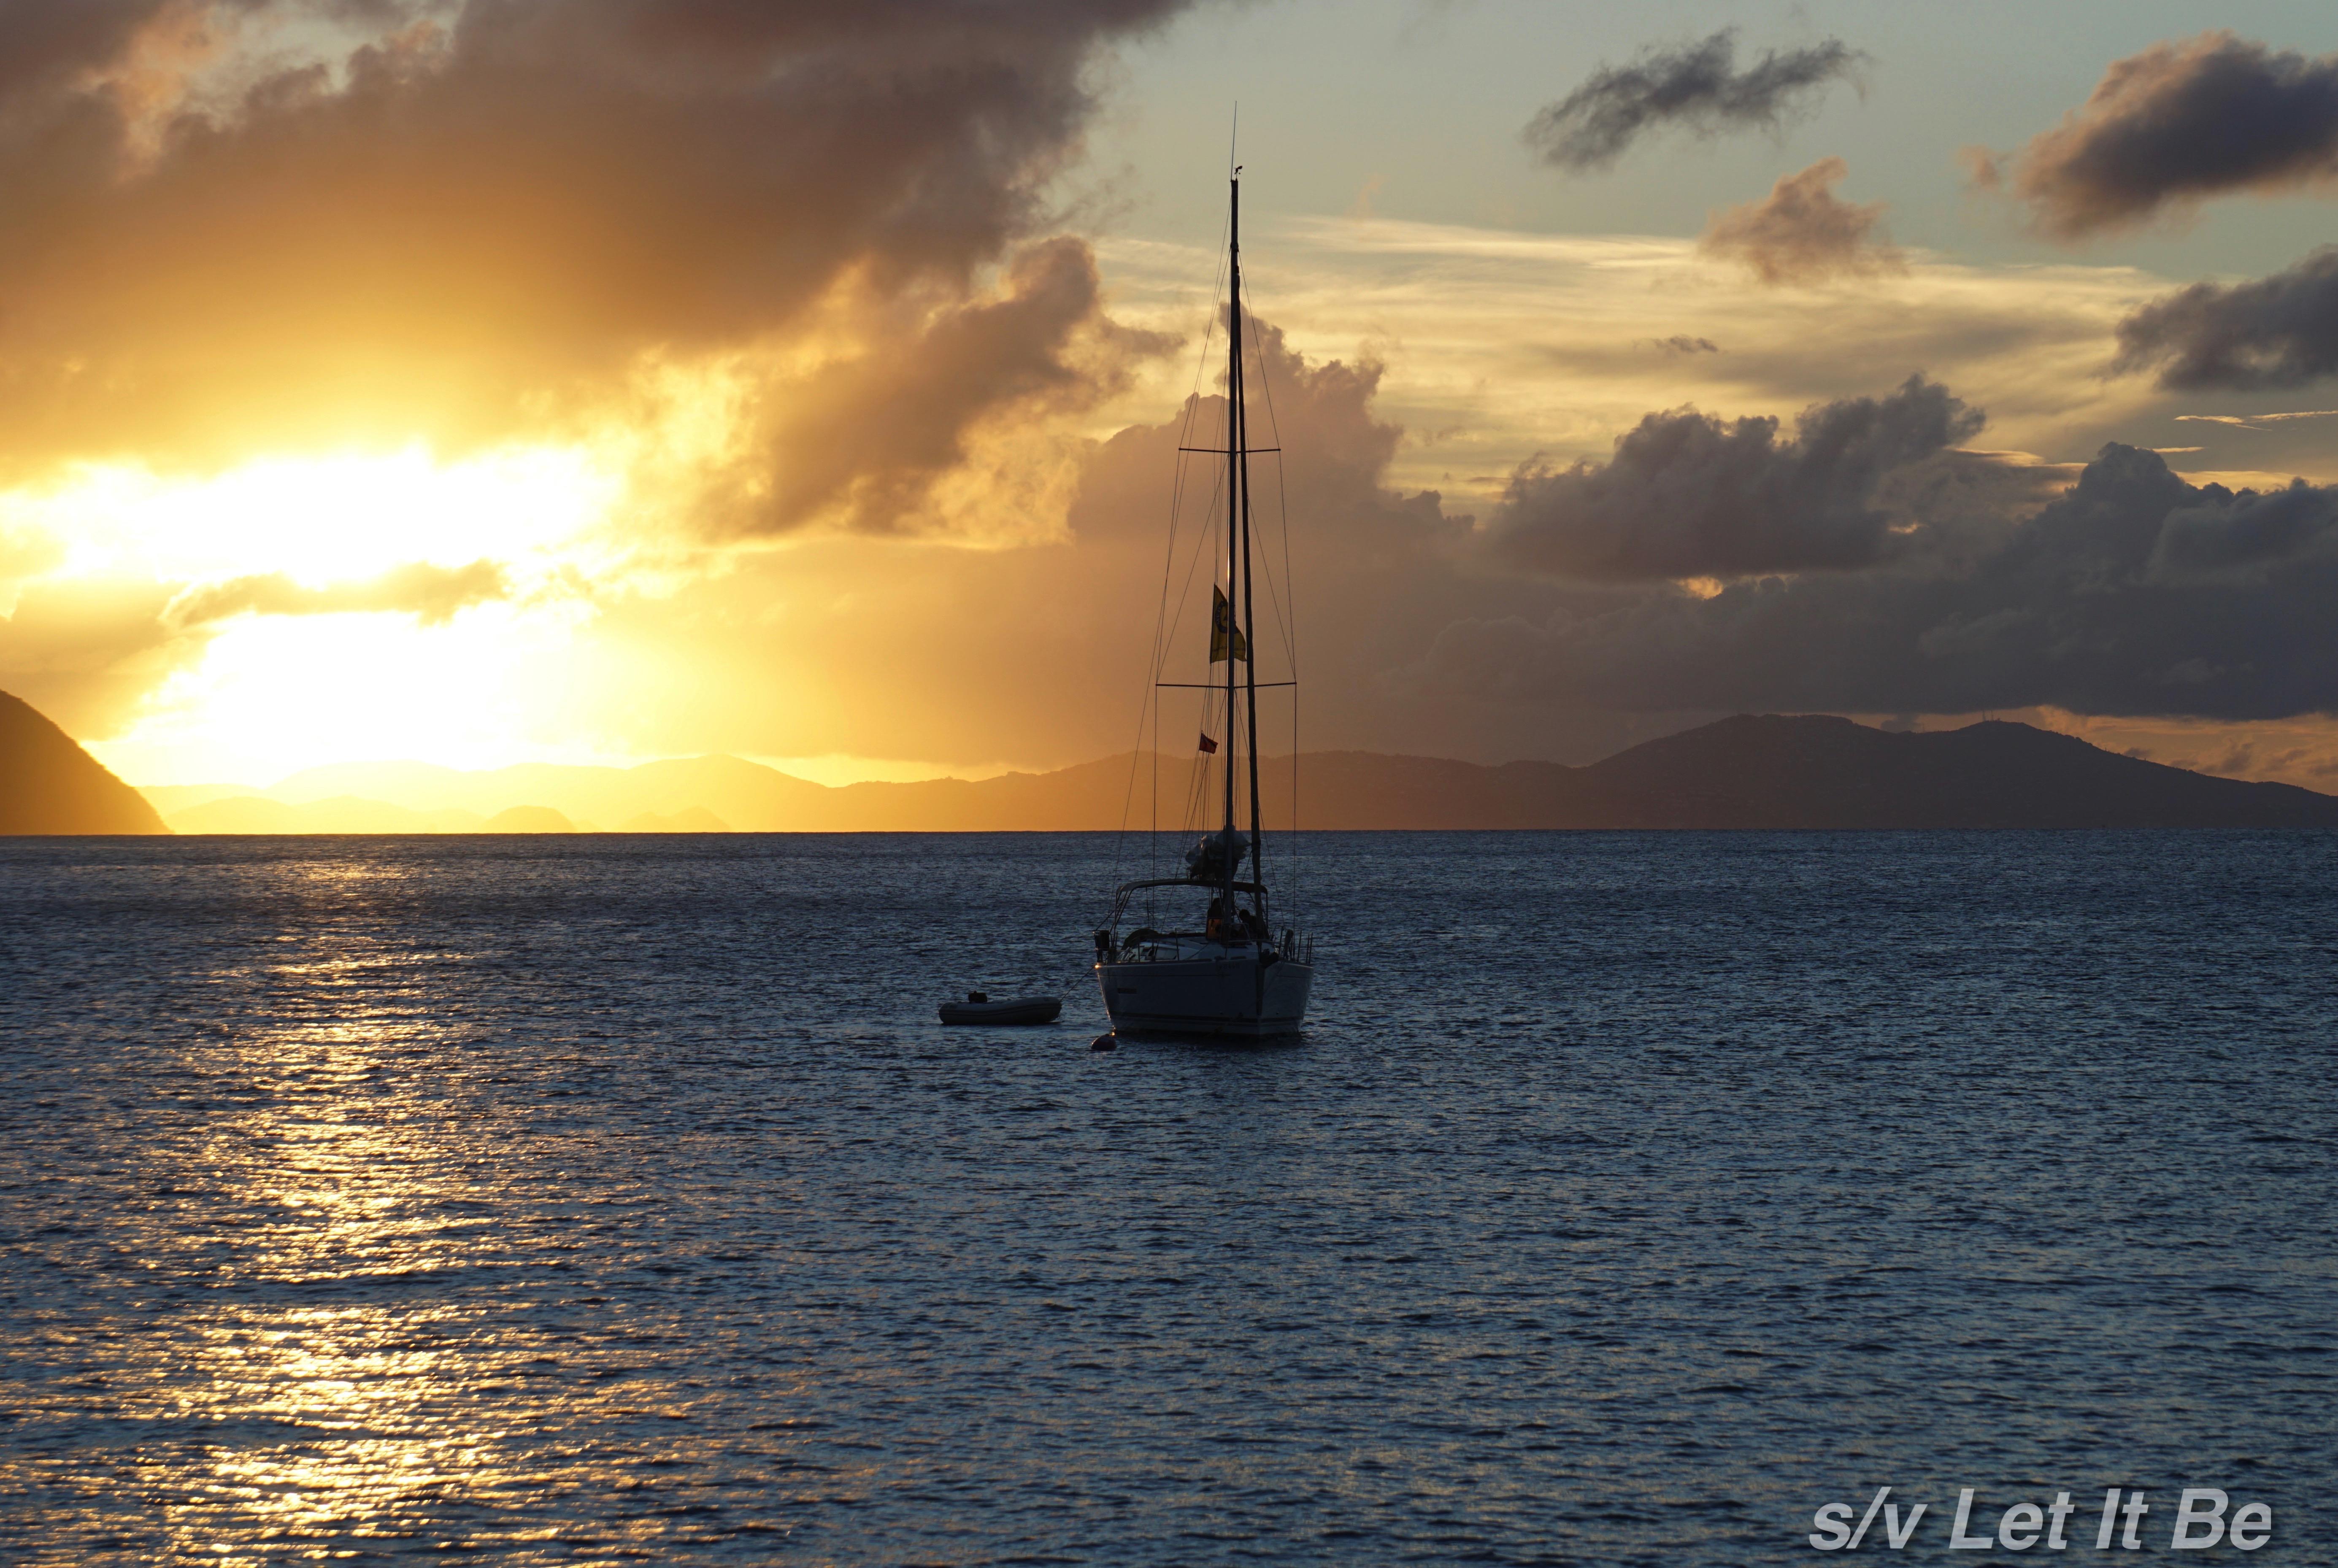 sunset-1 4.13.03 PM